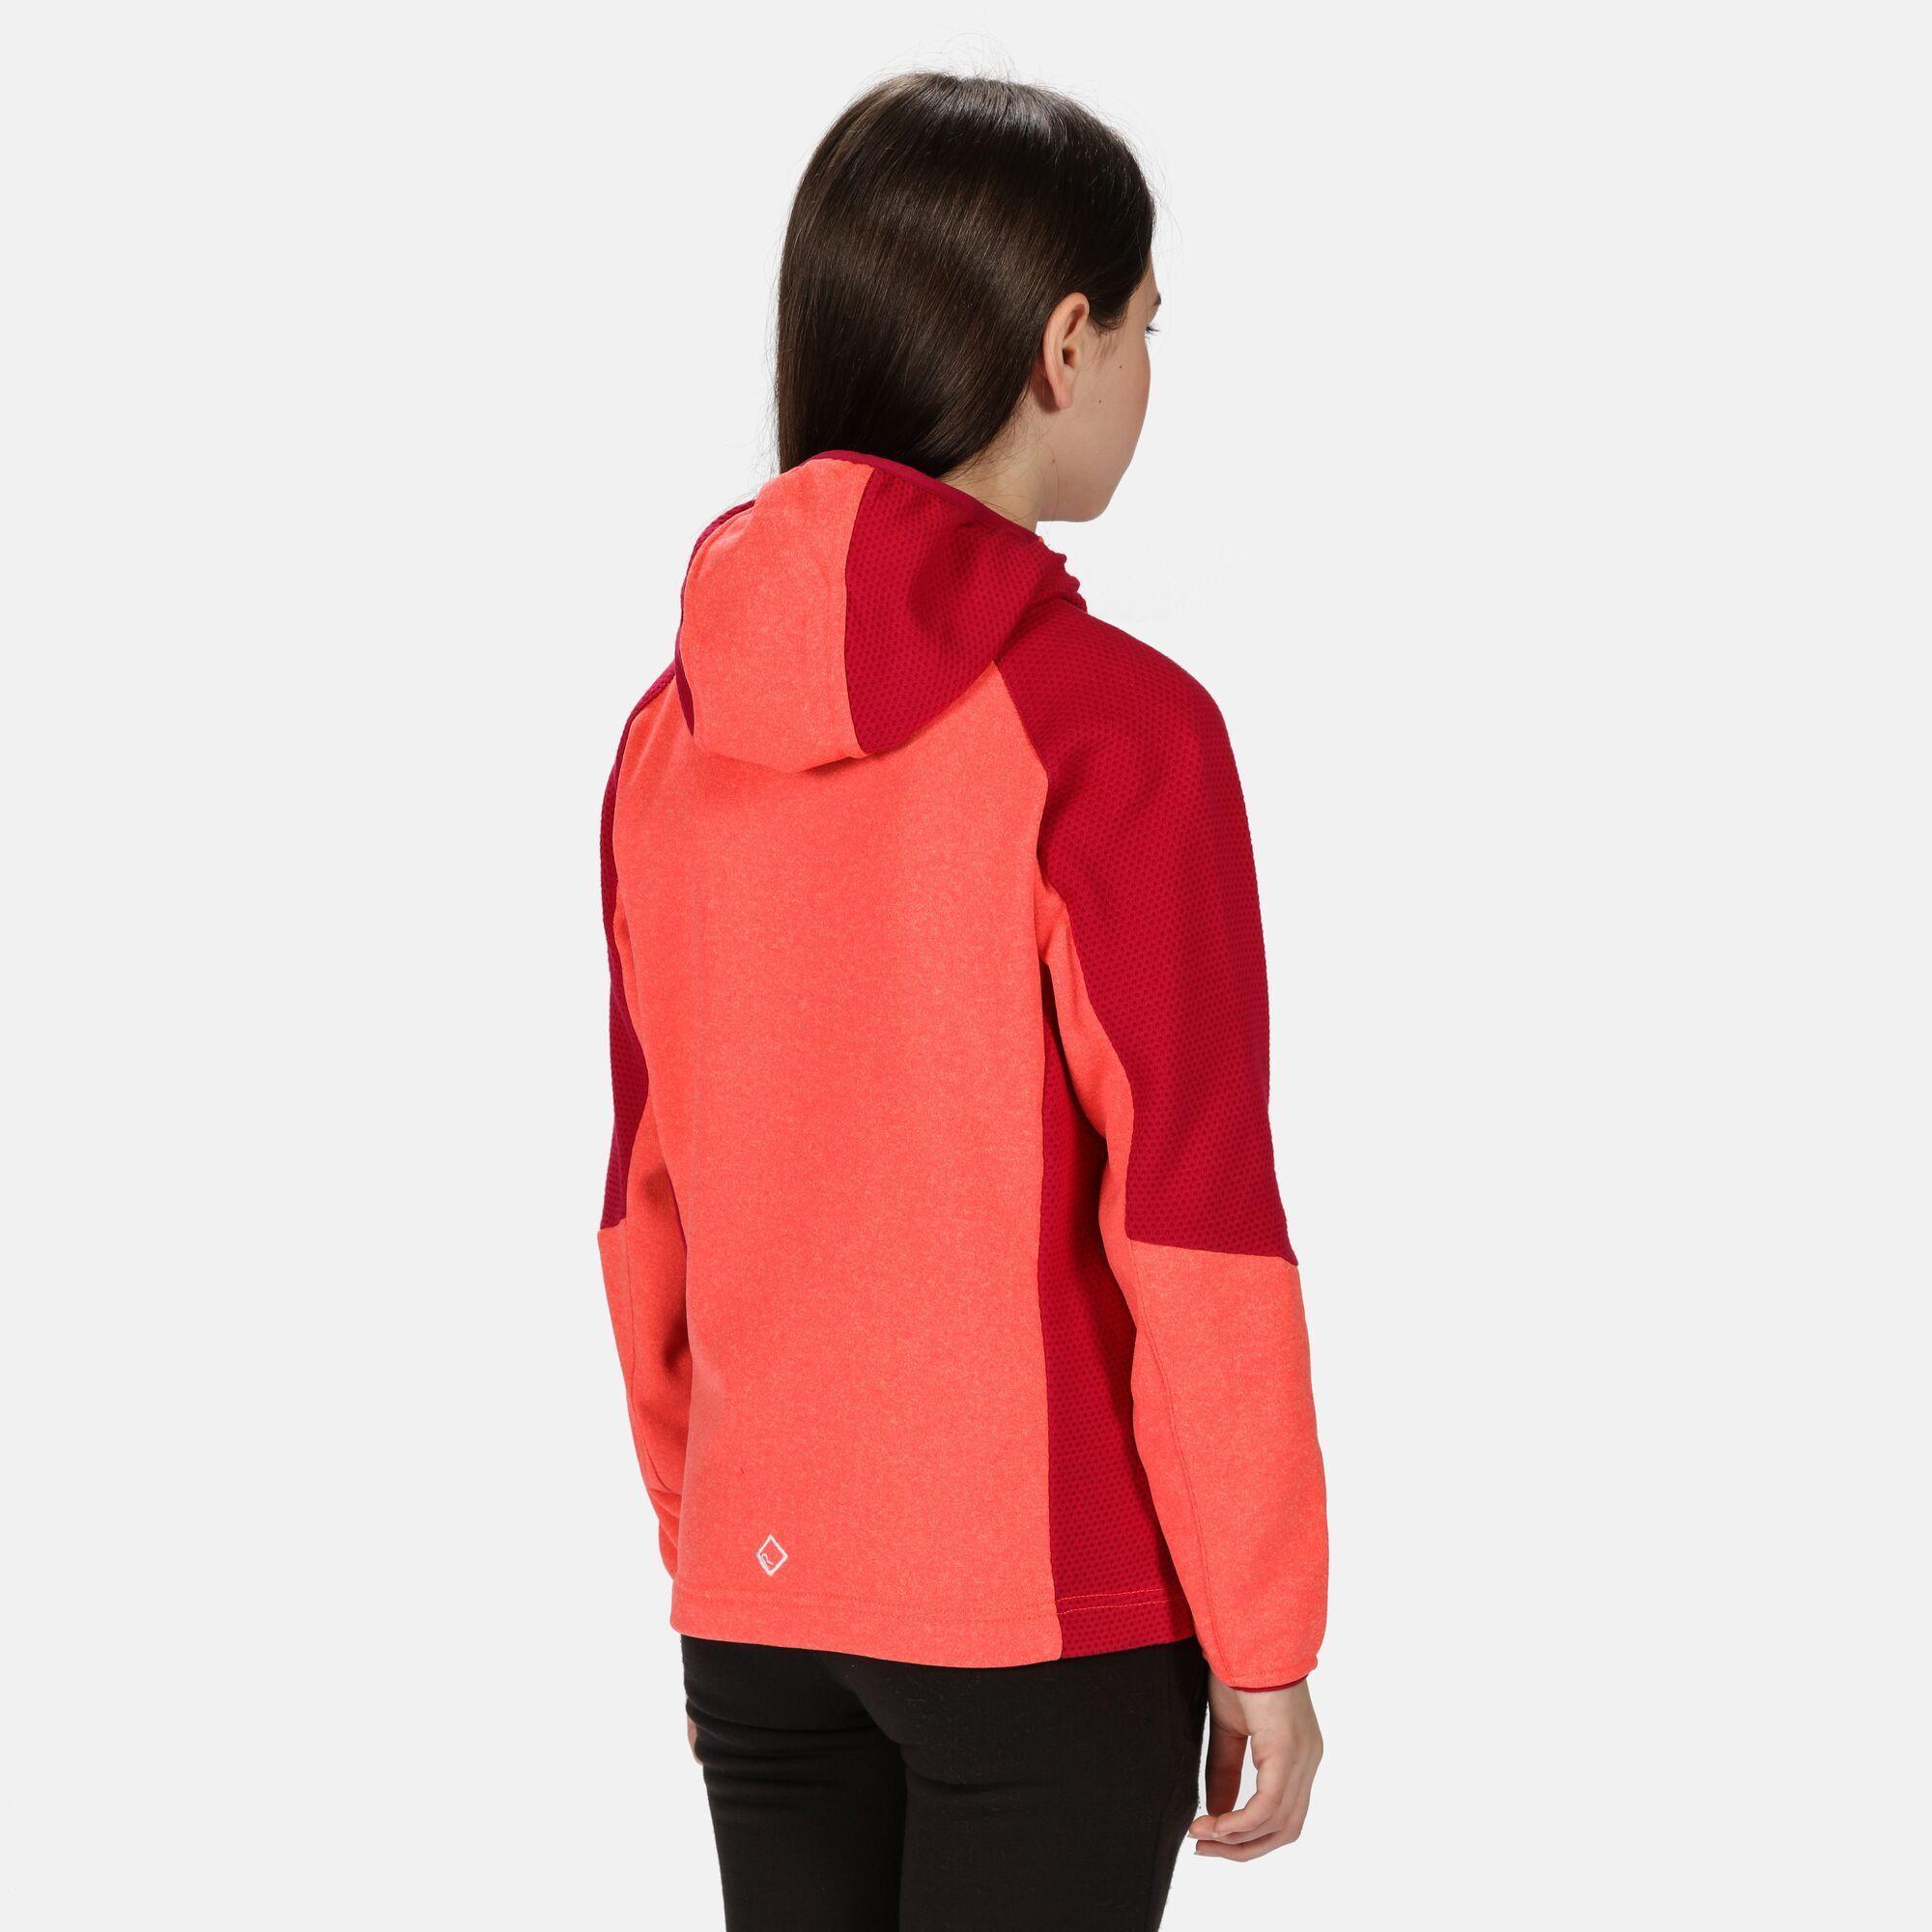 Regatta Childrens/Kids Lostock Fleece Jacket (Fiery Coral/Dark Cerise)